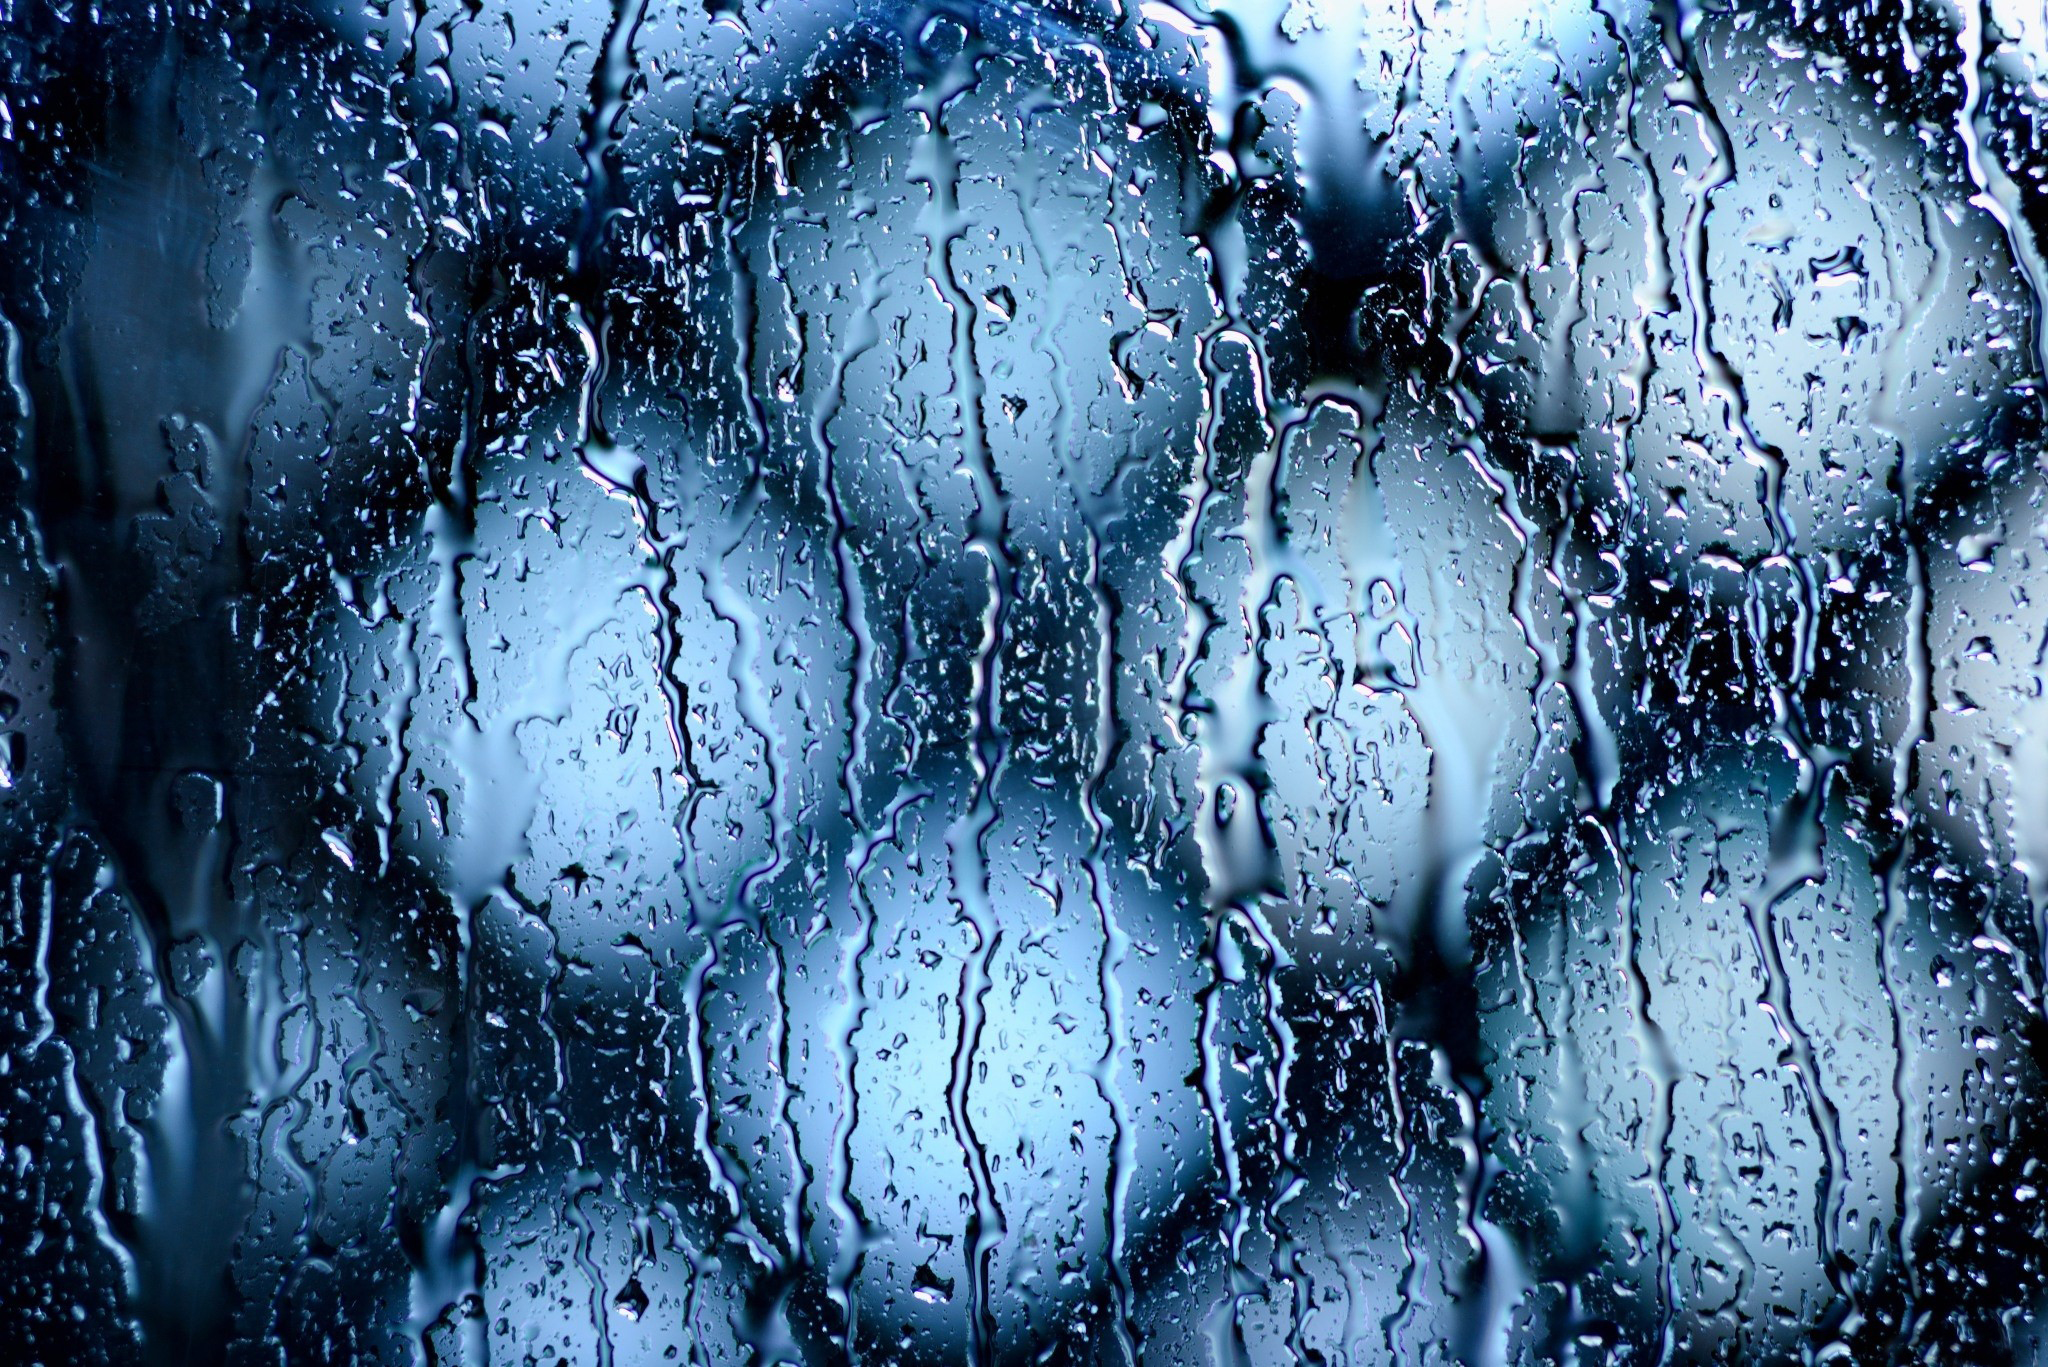 макро, стекло, вода, свет бесплатно